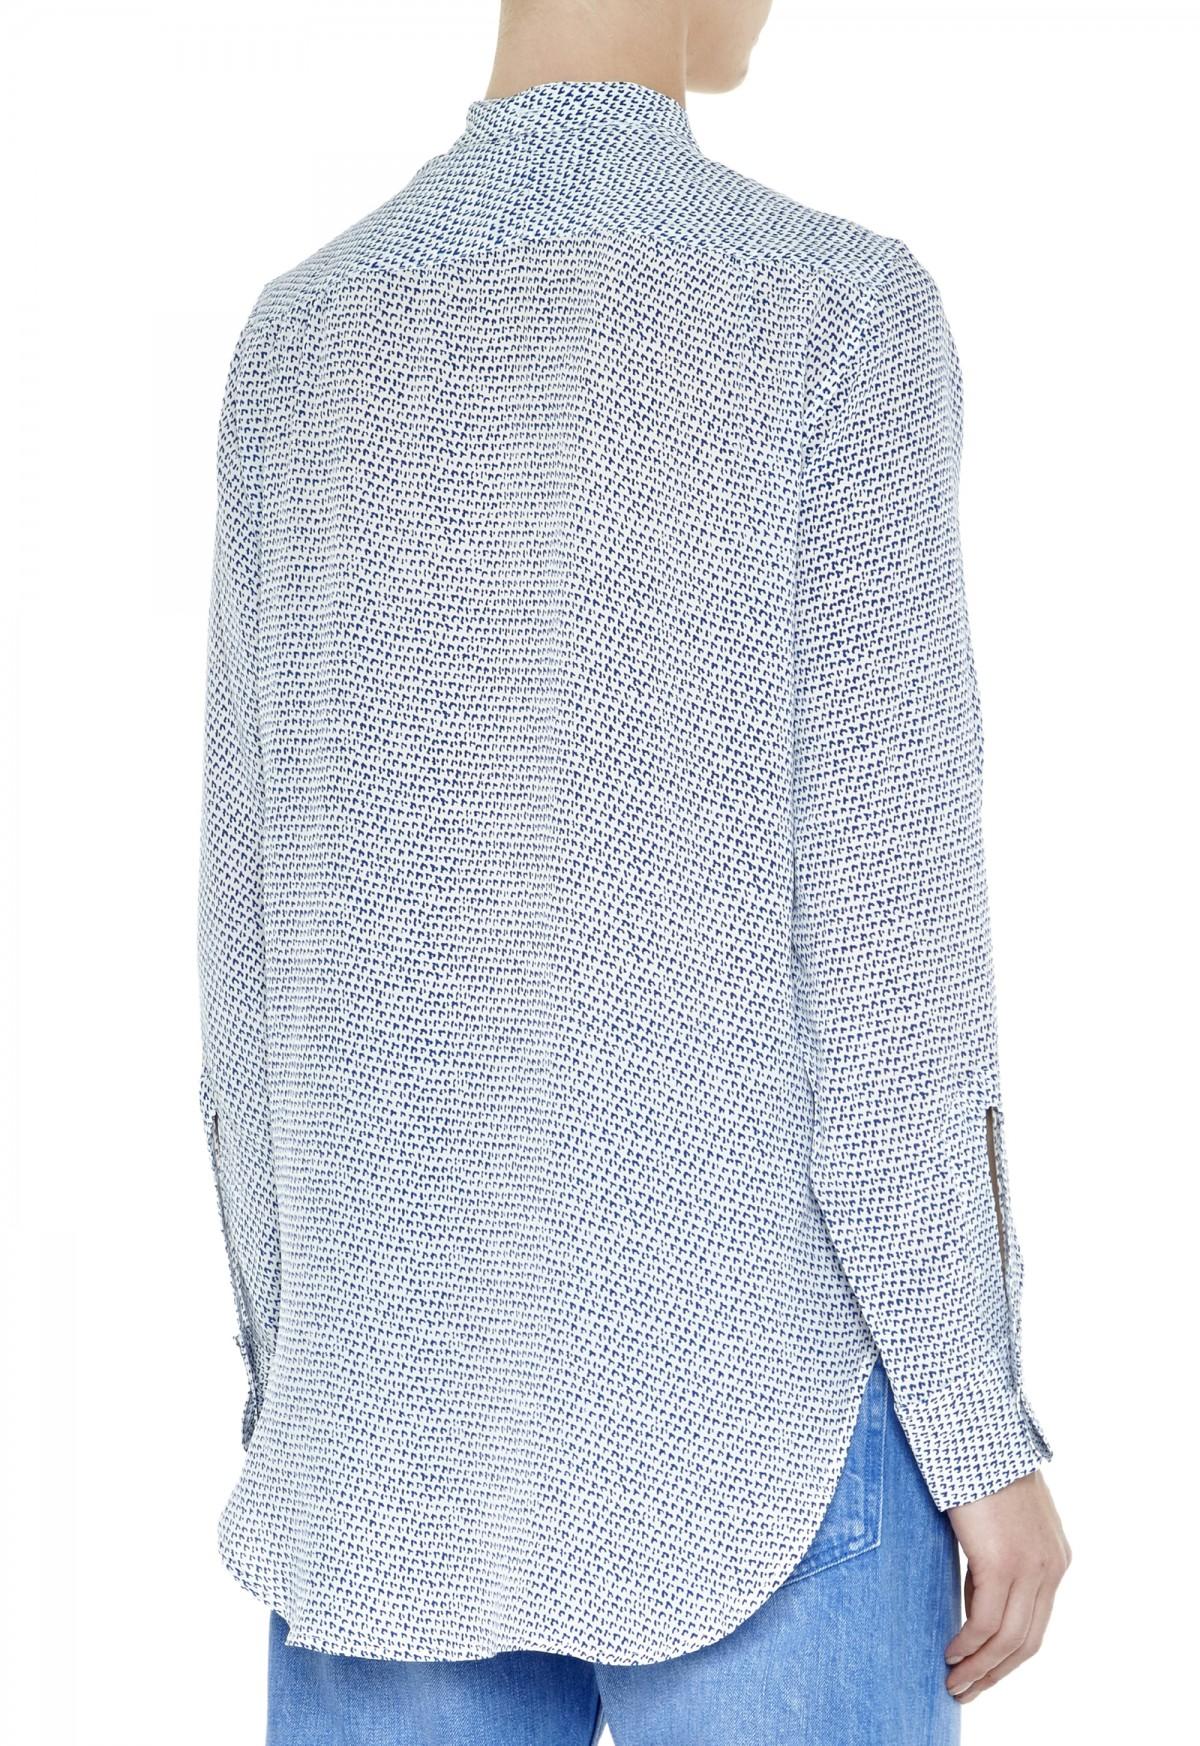 MIH Jeans Tails Shirt in Mini Leo Print | TresChicNow.com